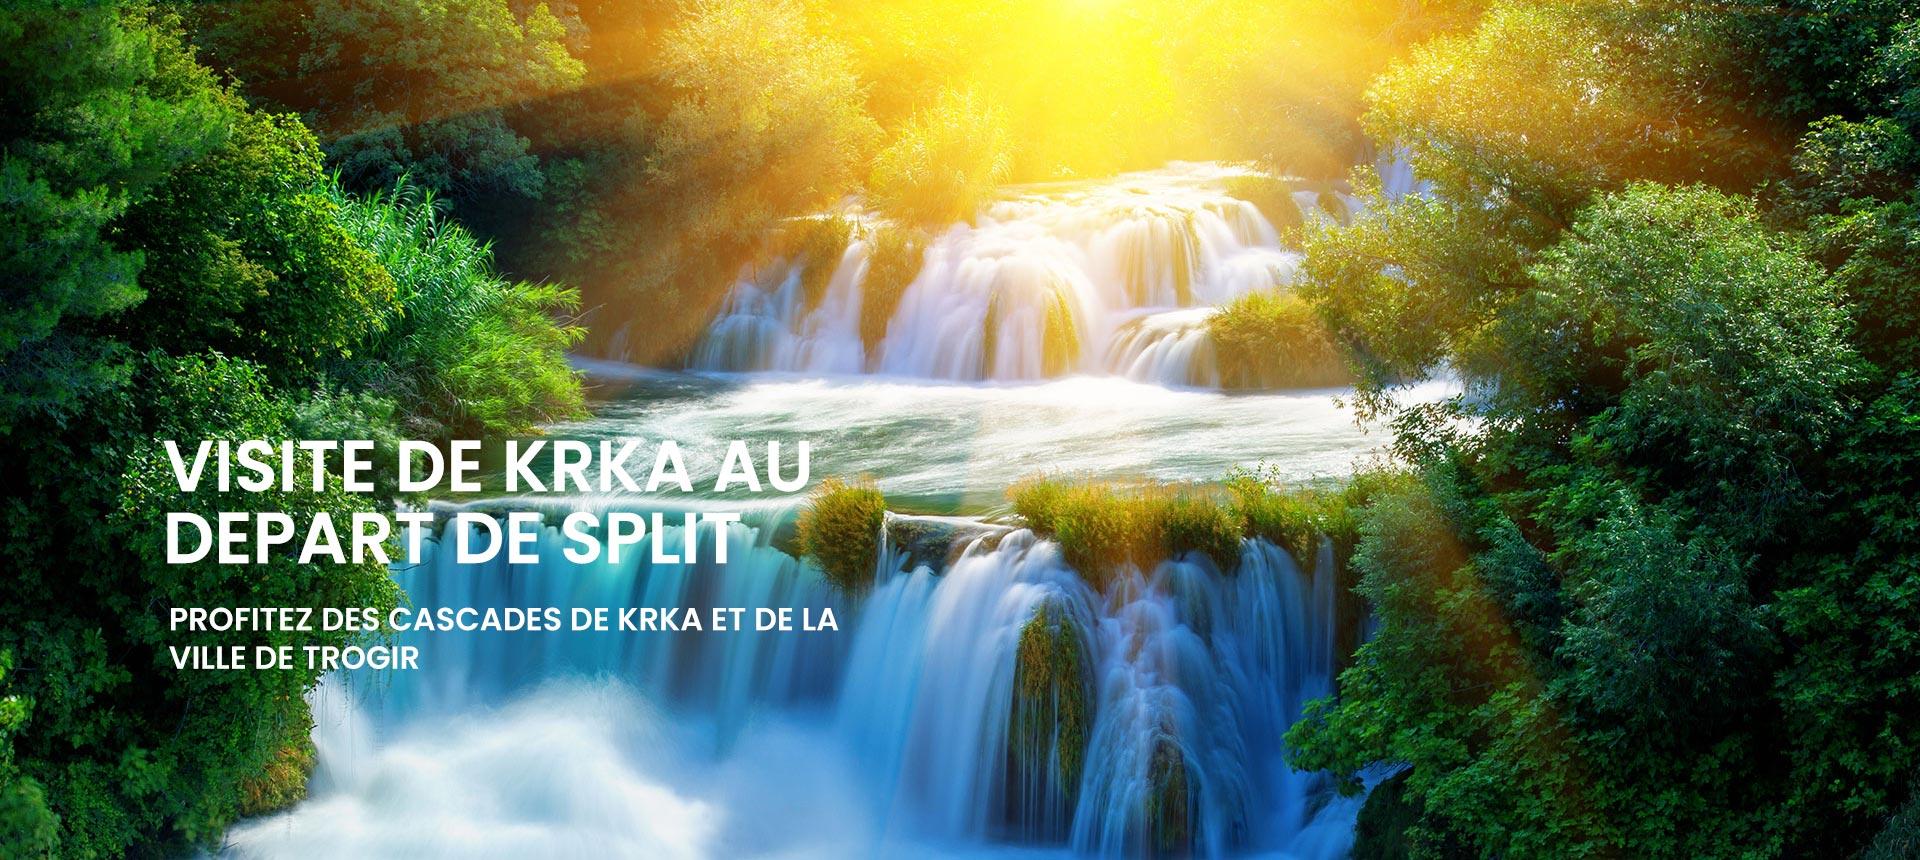 Visite De Krka Au Depart De Split